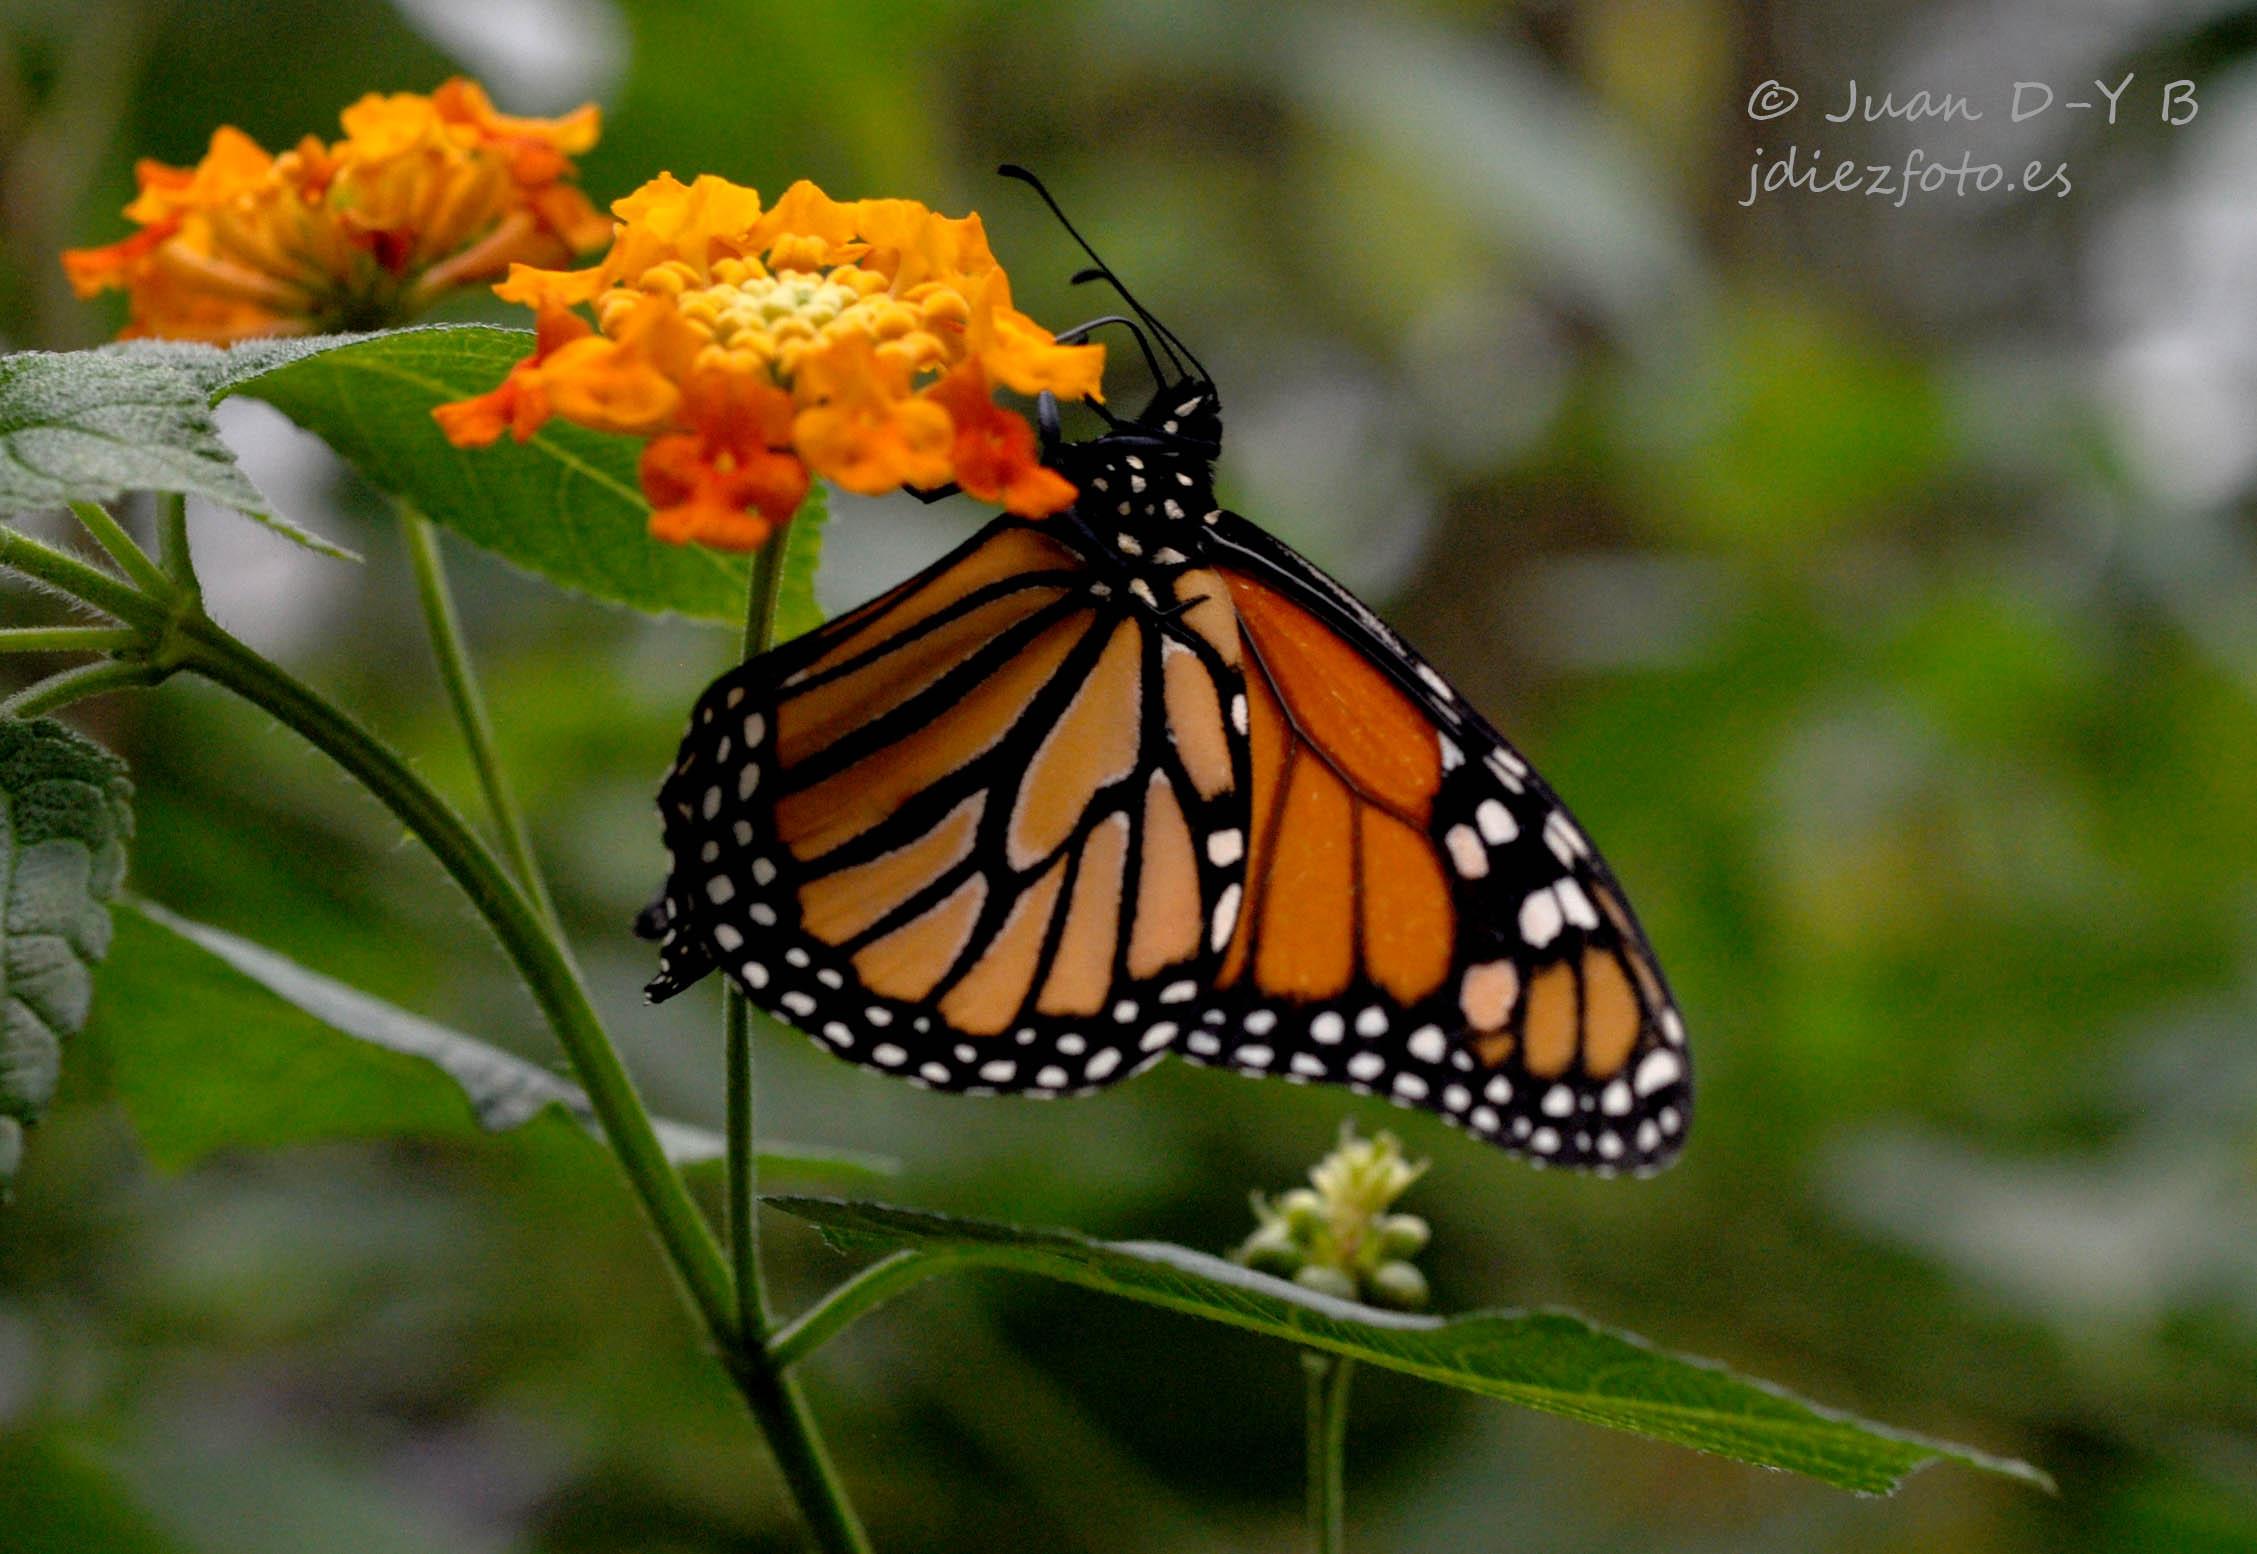 Mariposa en el Zoo de Santillana del Mar